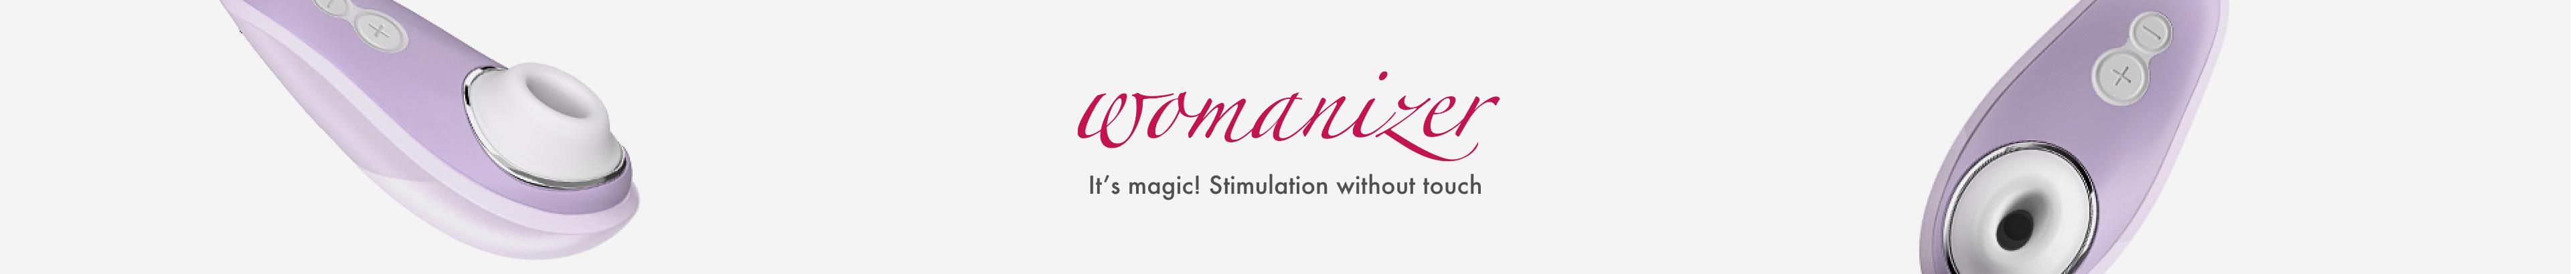 Womanizer - It's Magic stimulation without touch